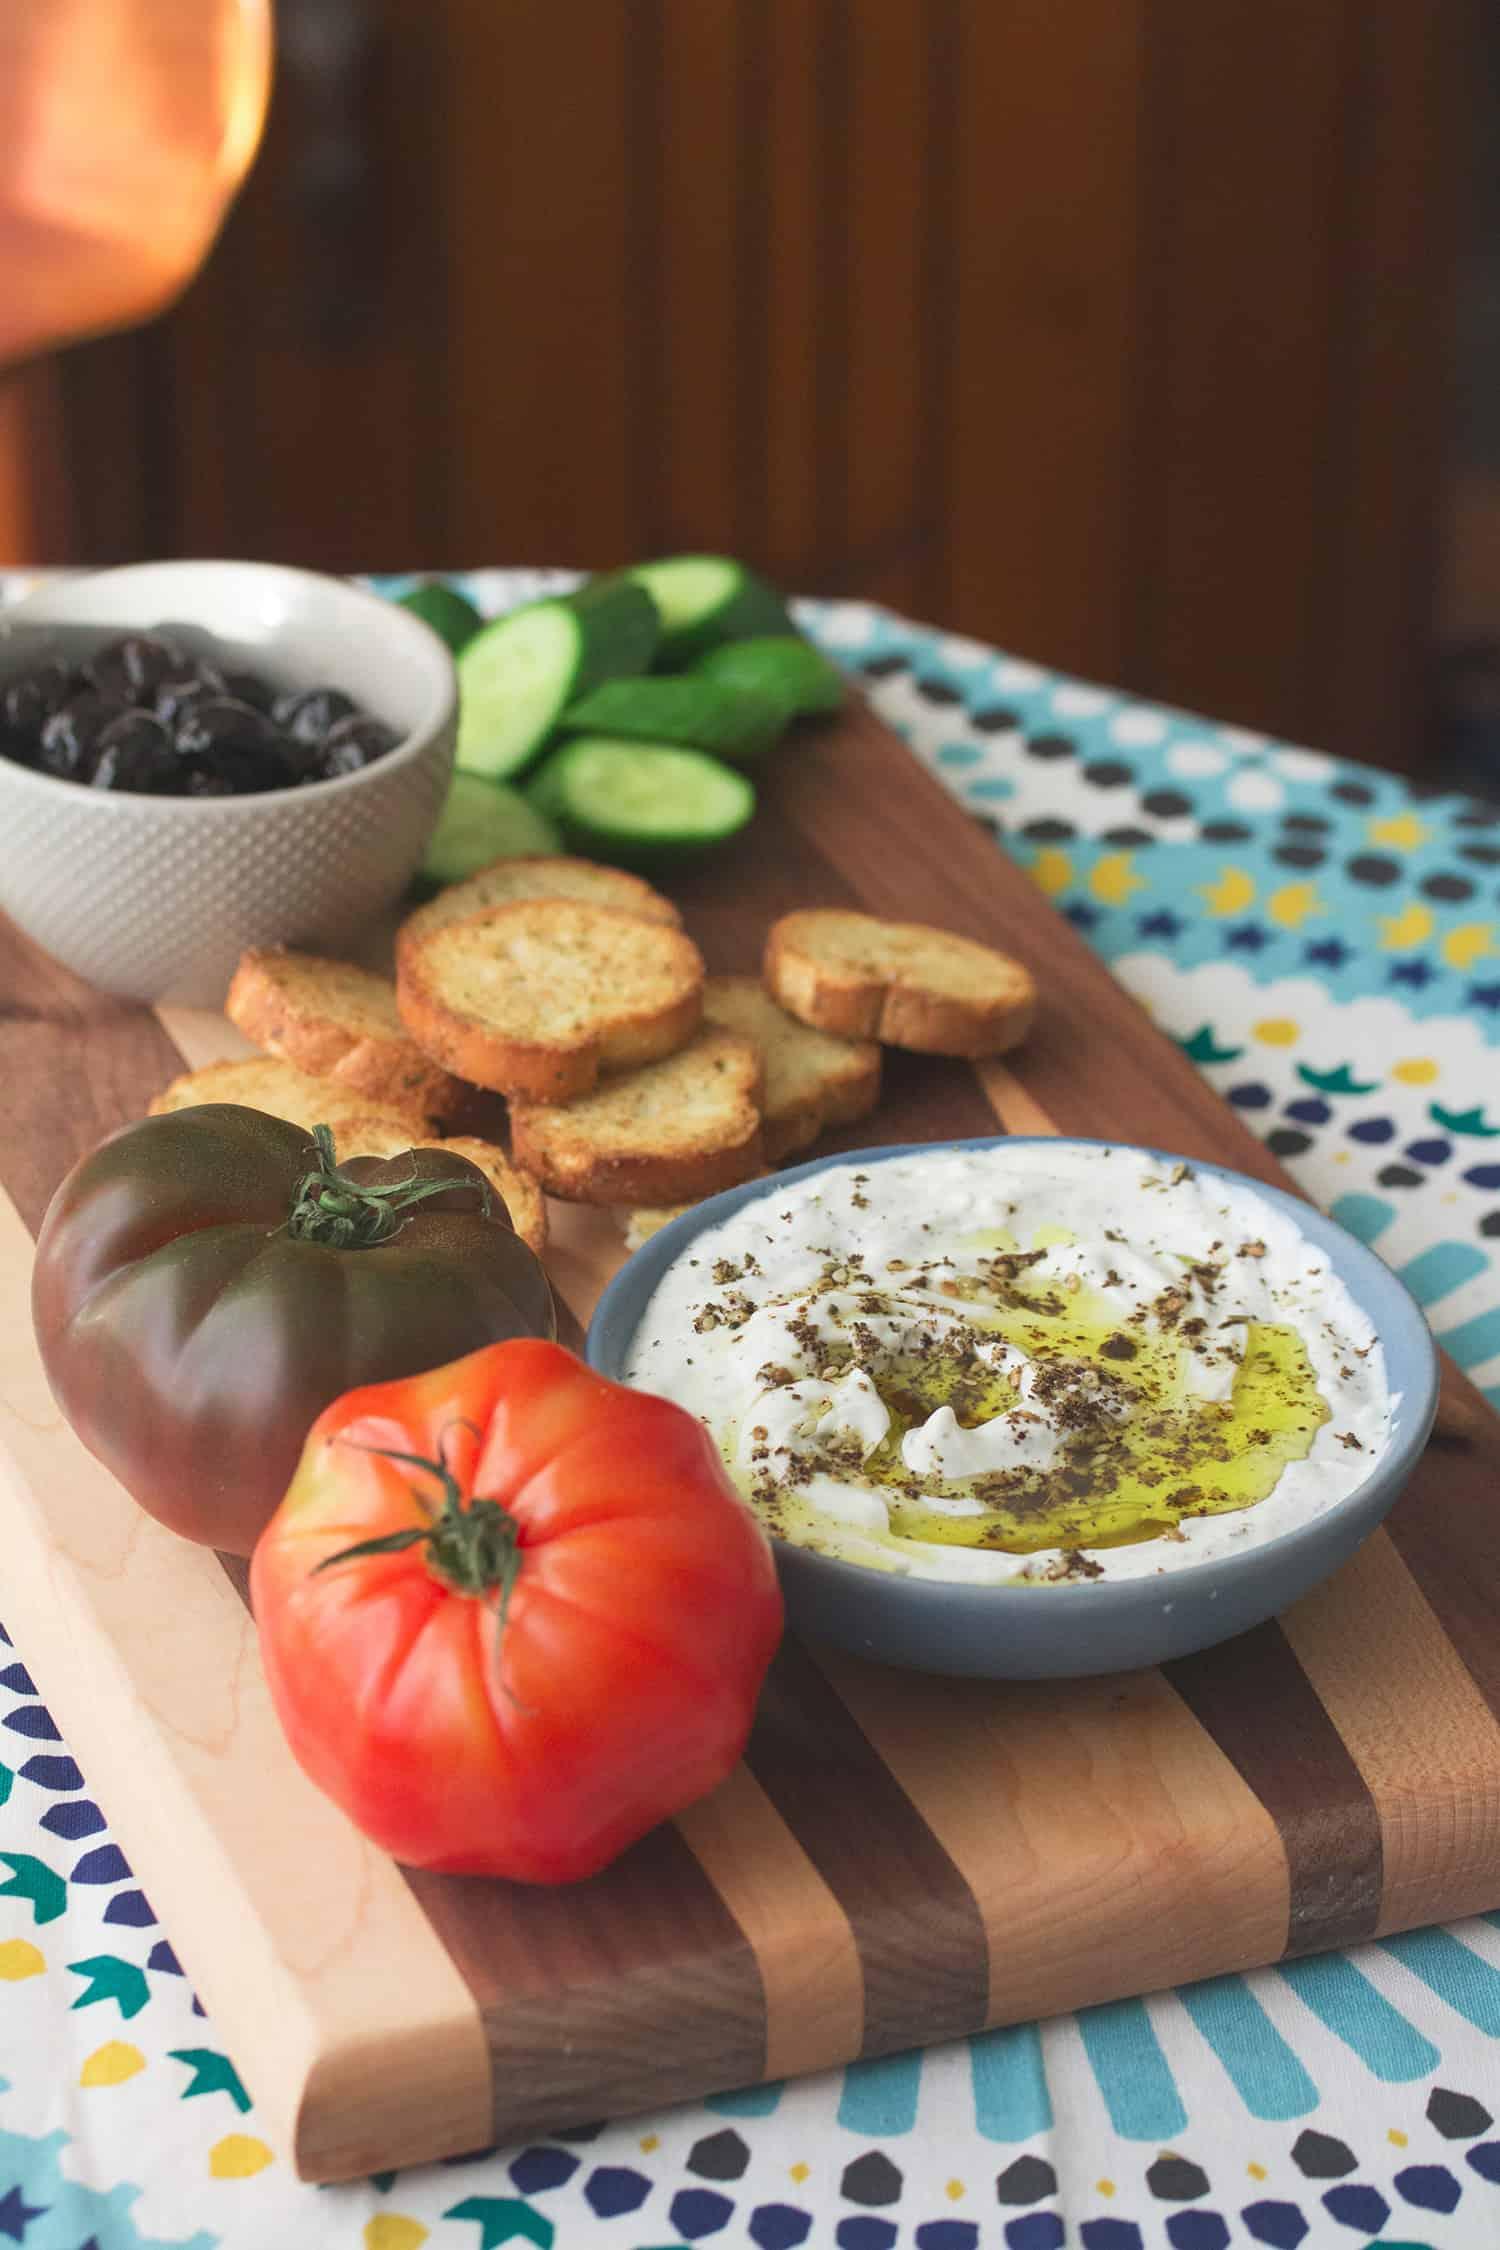 Got Your Goat: How to Make Labneh (aka Yogurt Cheese)